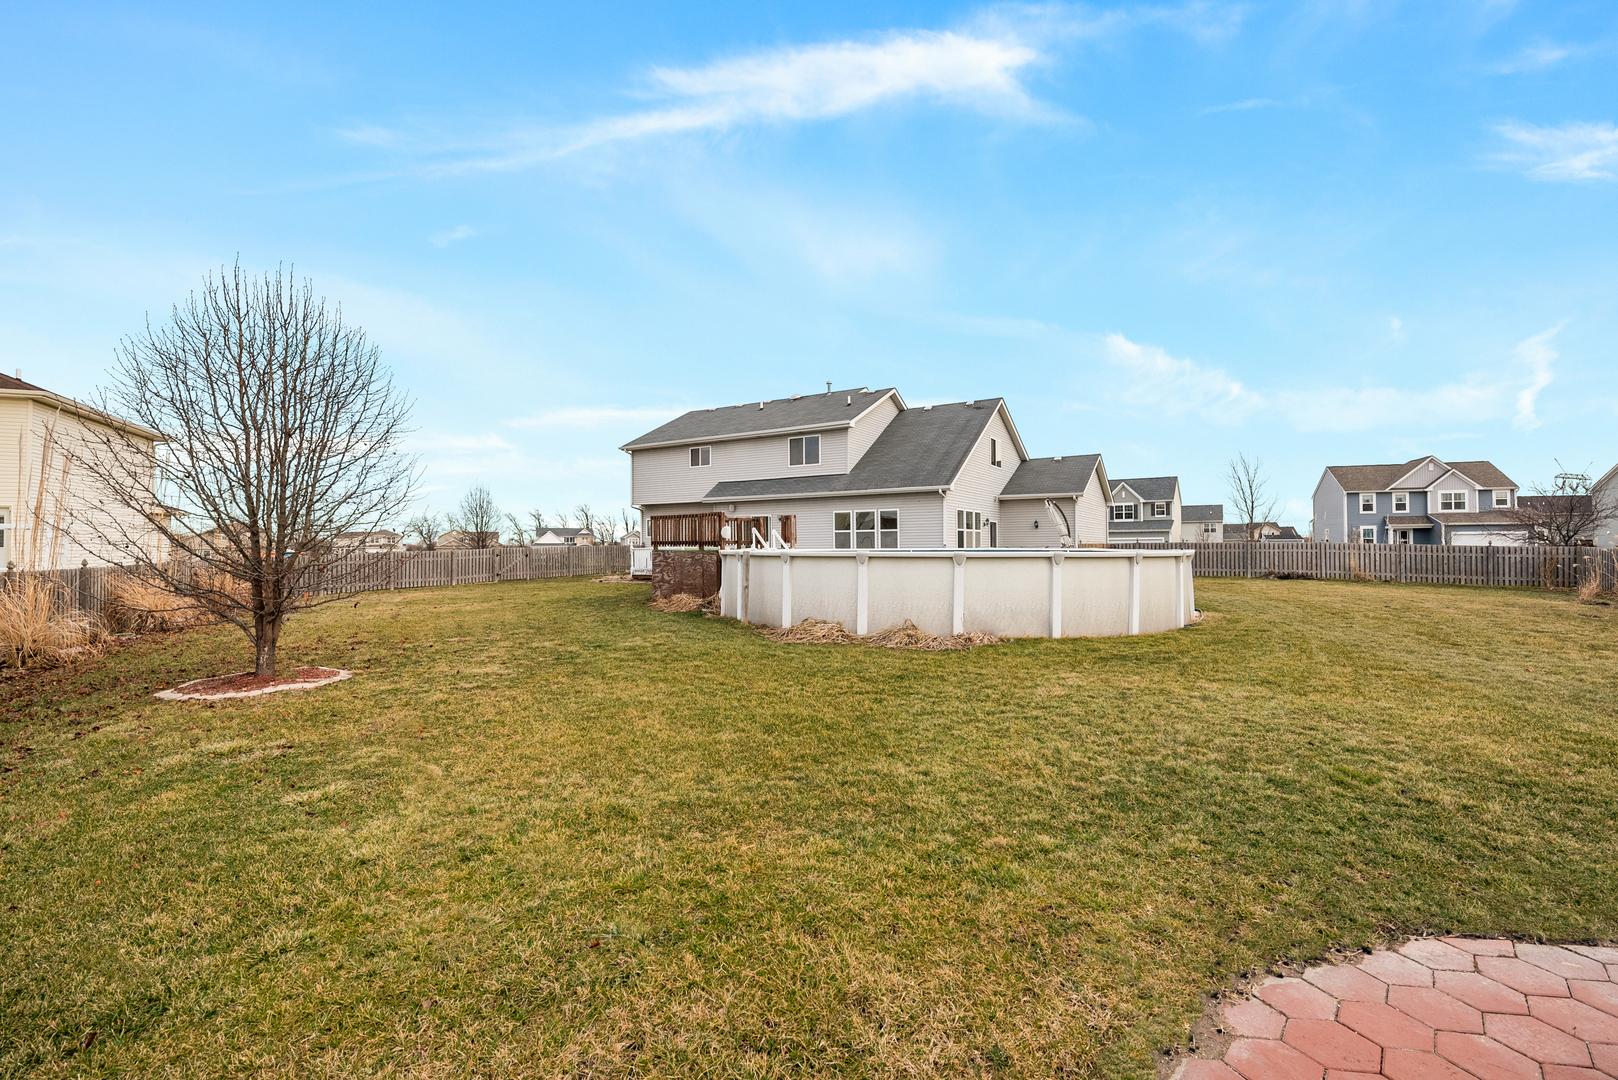 26454 West Old Farm, Channahon, Illinois, 60410